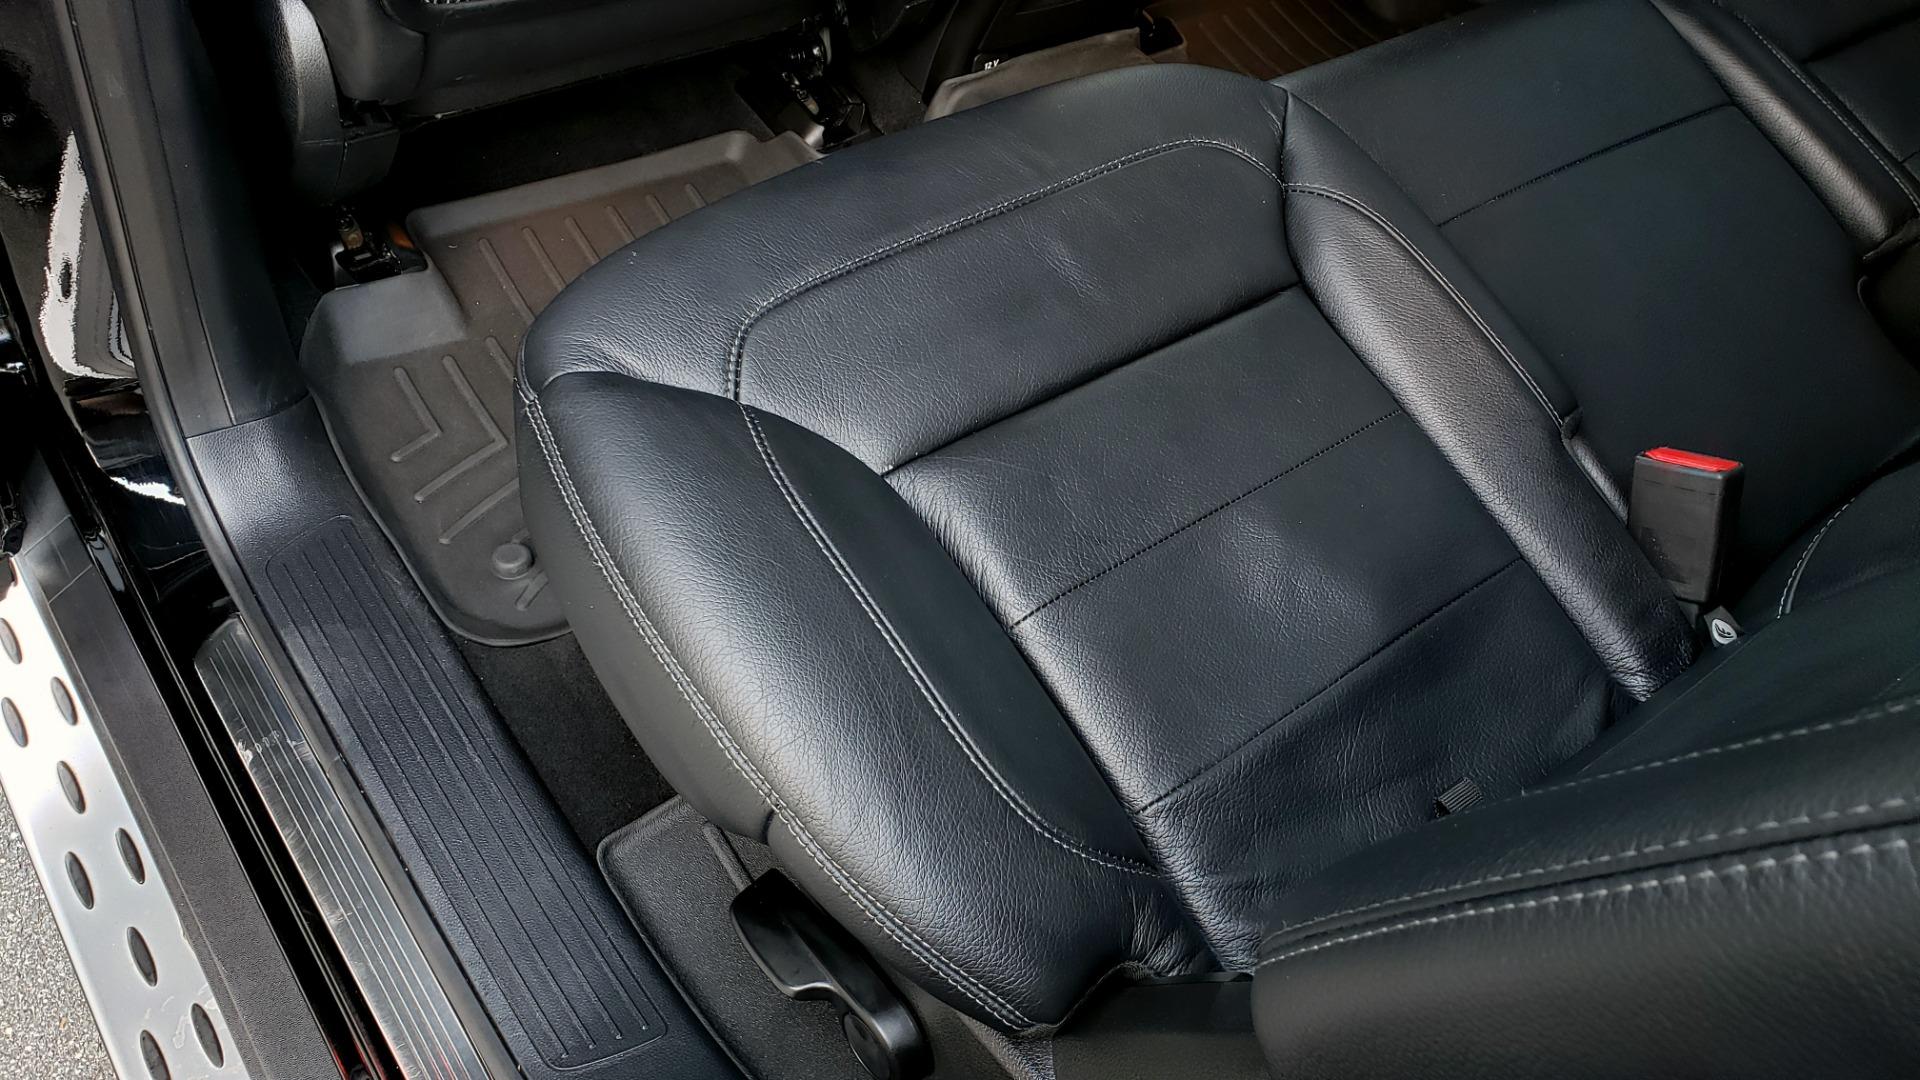 Used 2017 Mercedes-Benz GLS GLS 550 for sale Sold at Formula Imports in Charlotte NC 28227 69